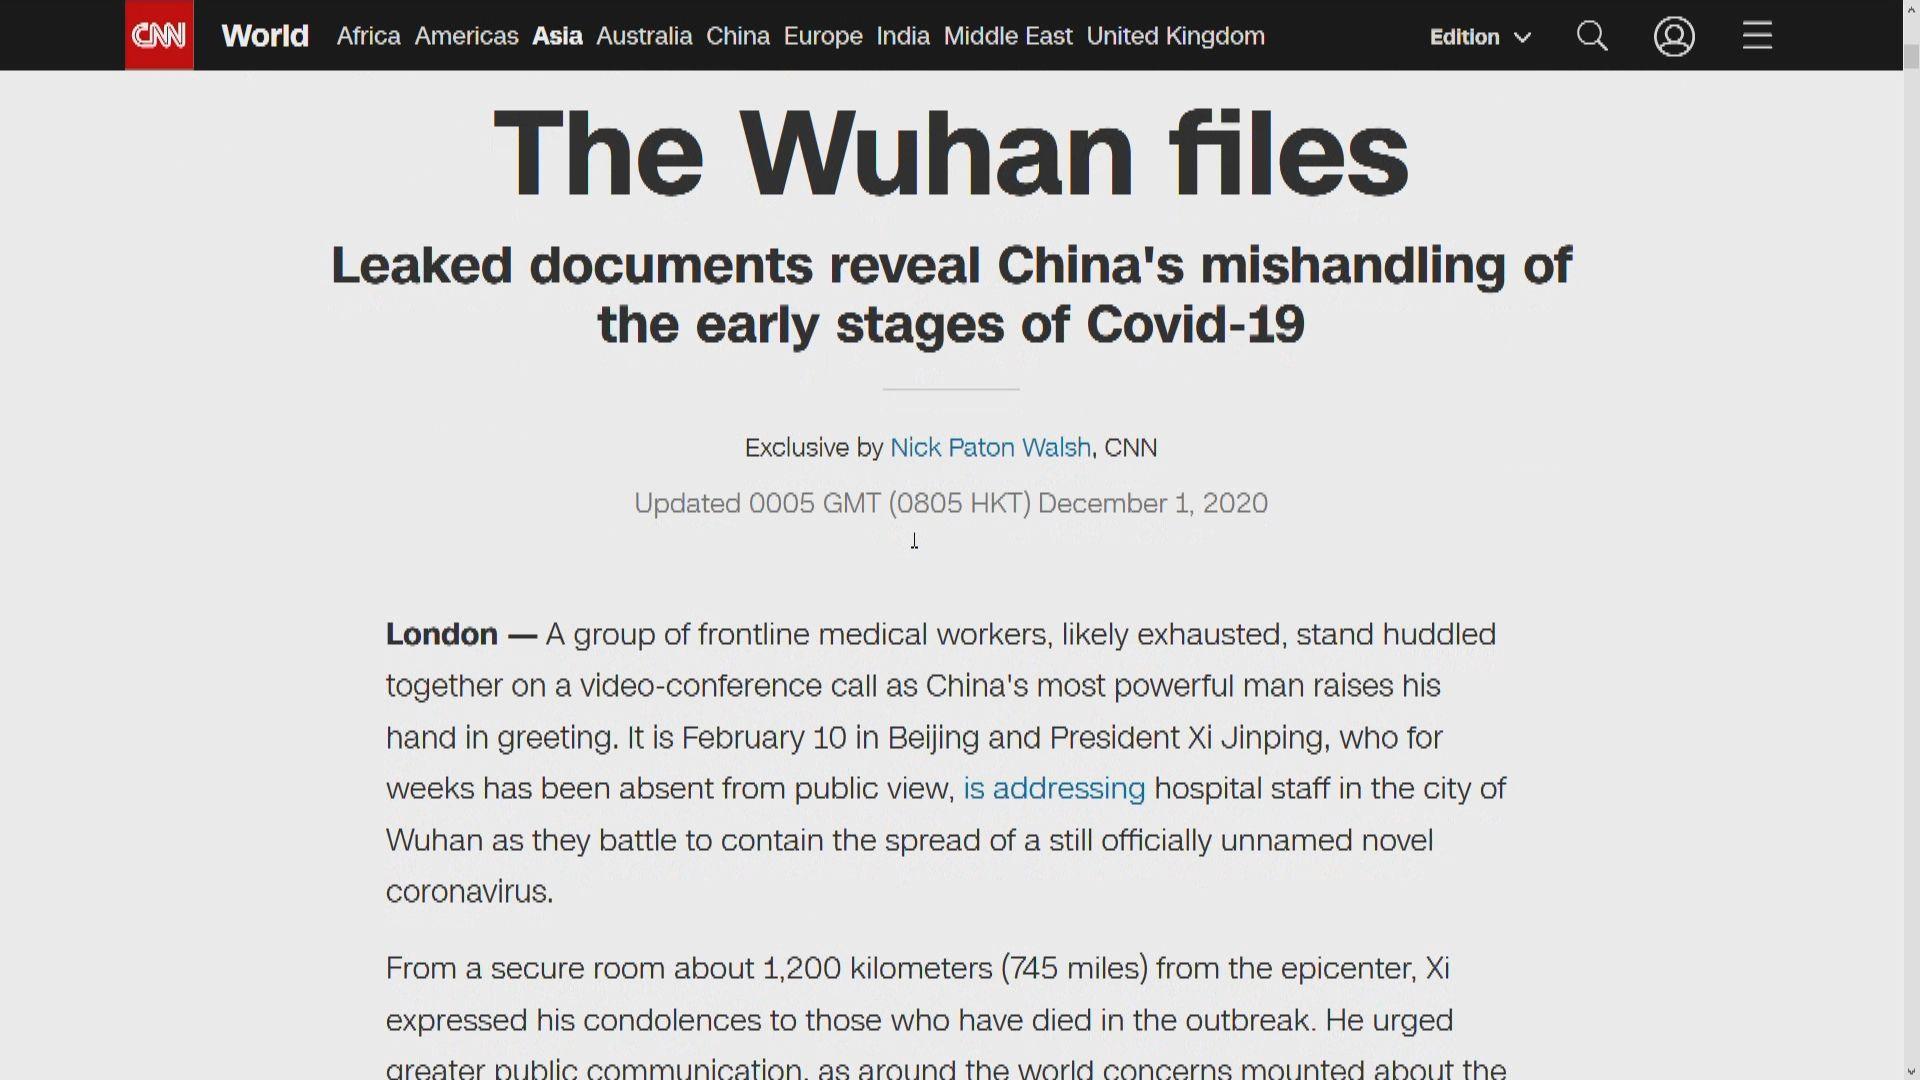 CNN獲湖北官方文件 揭內地內部與對外發放疫情資訊曾不一致